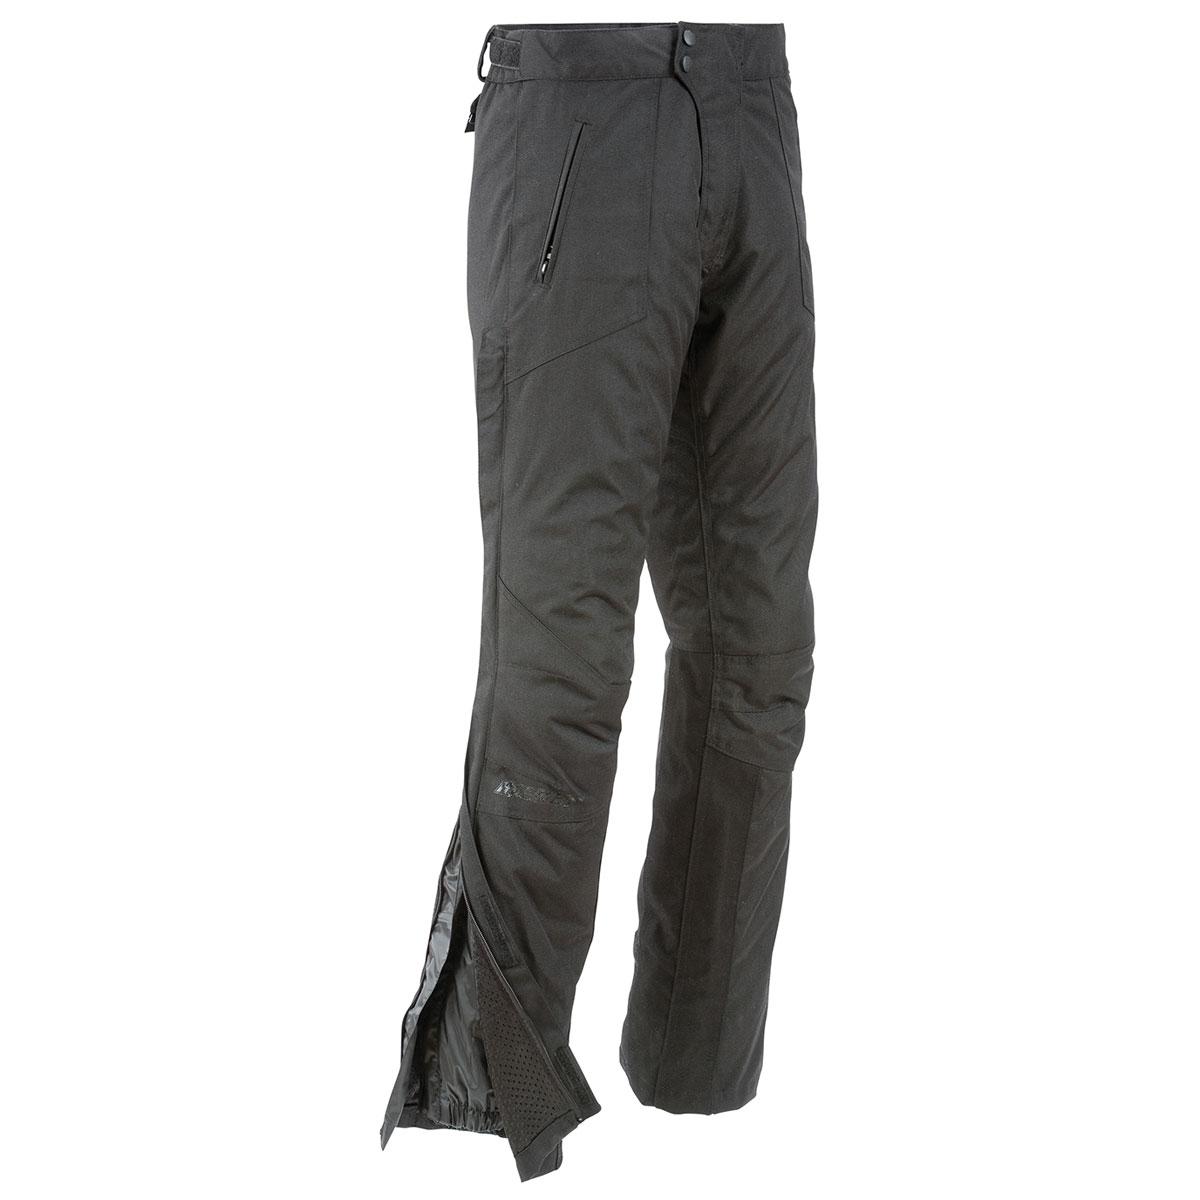 Joe Rocket Men's Ballistic 7.0 Black Over Pants